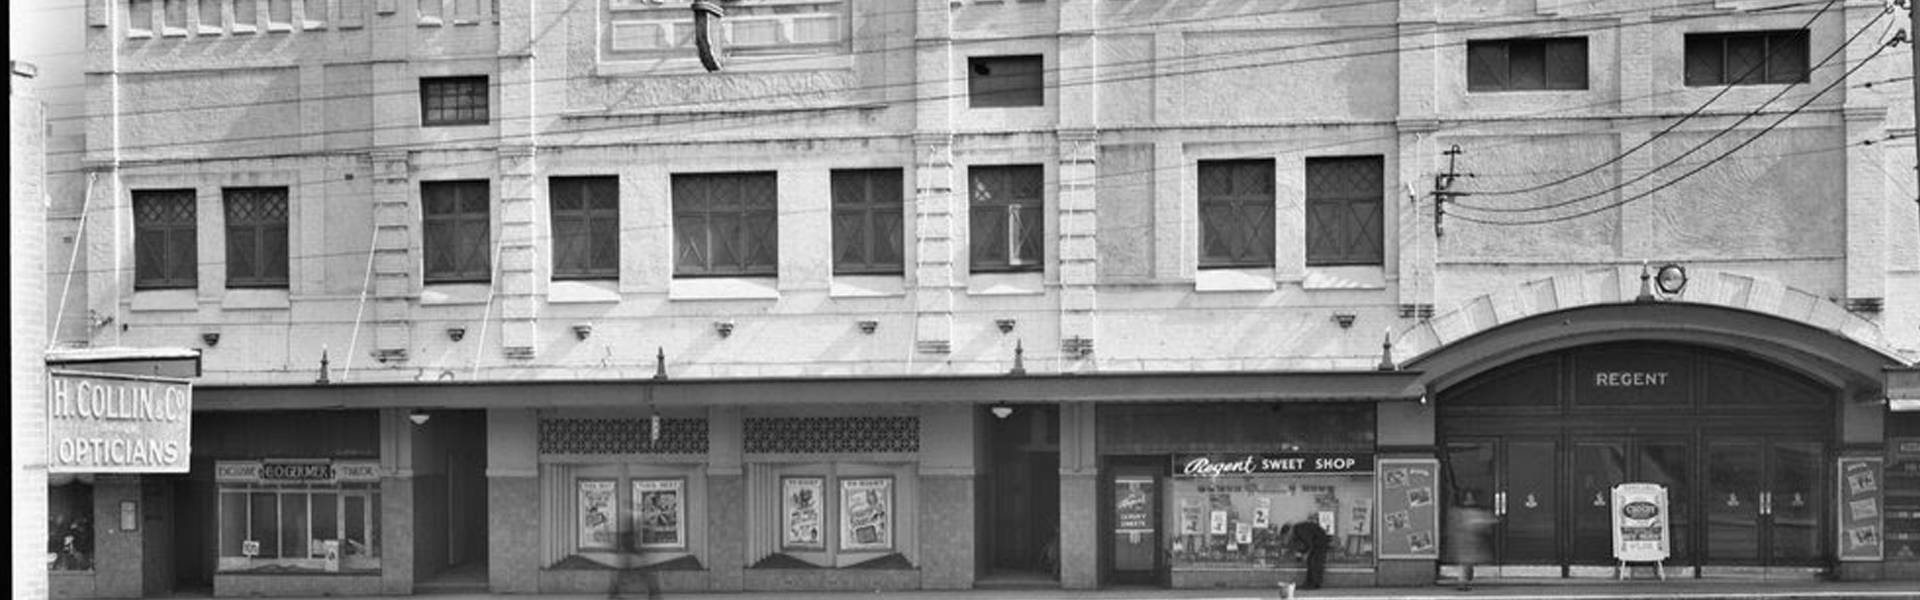 exterior of acot building